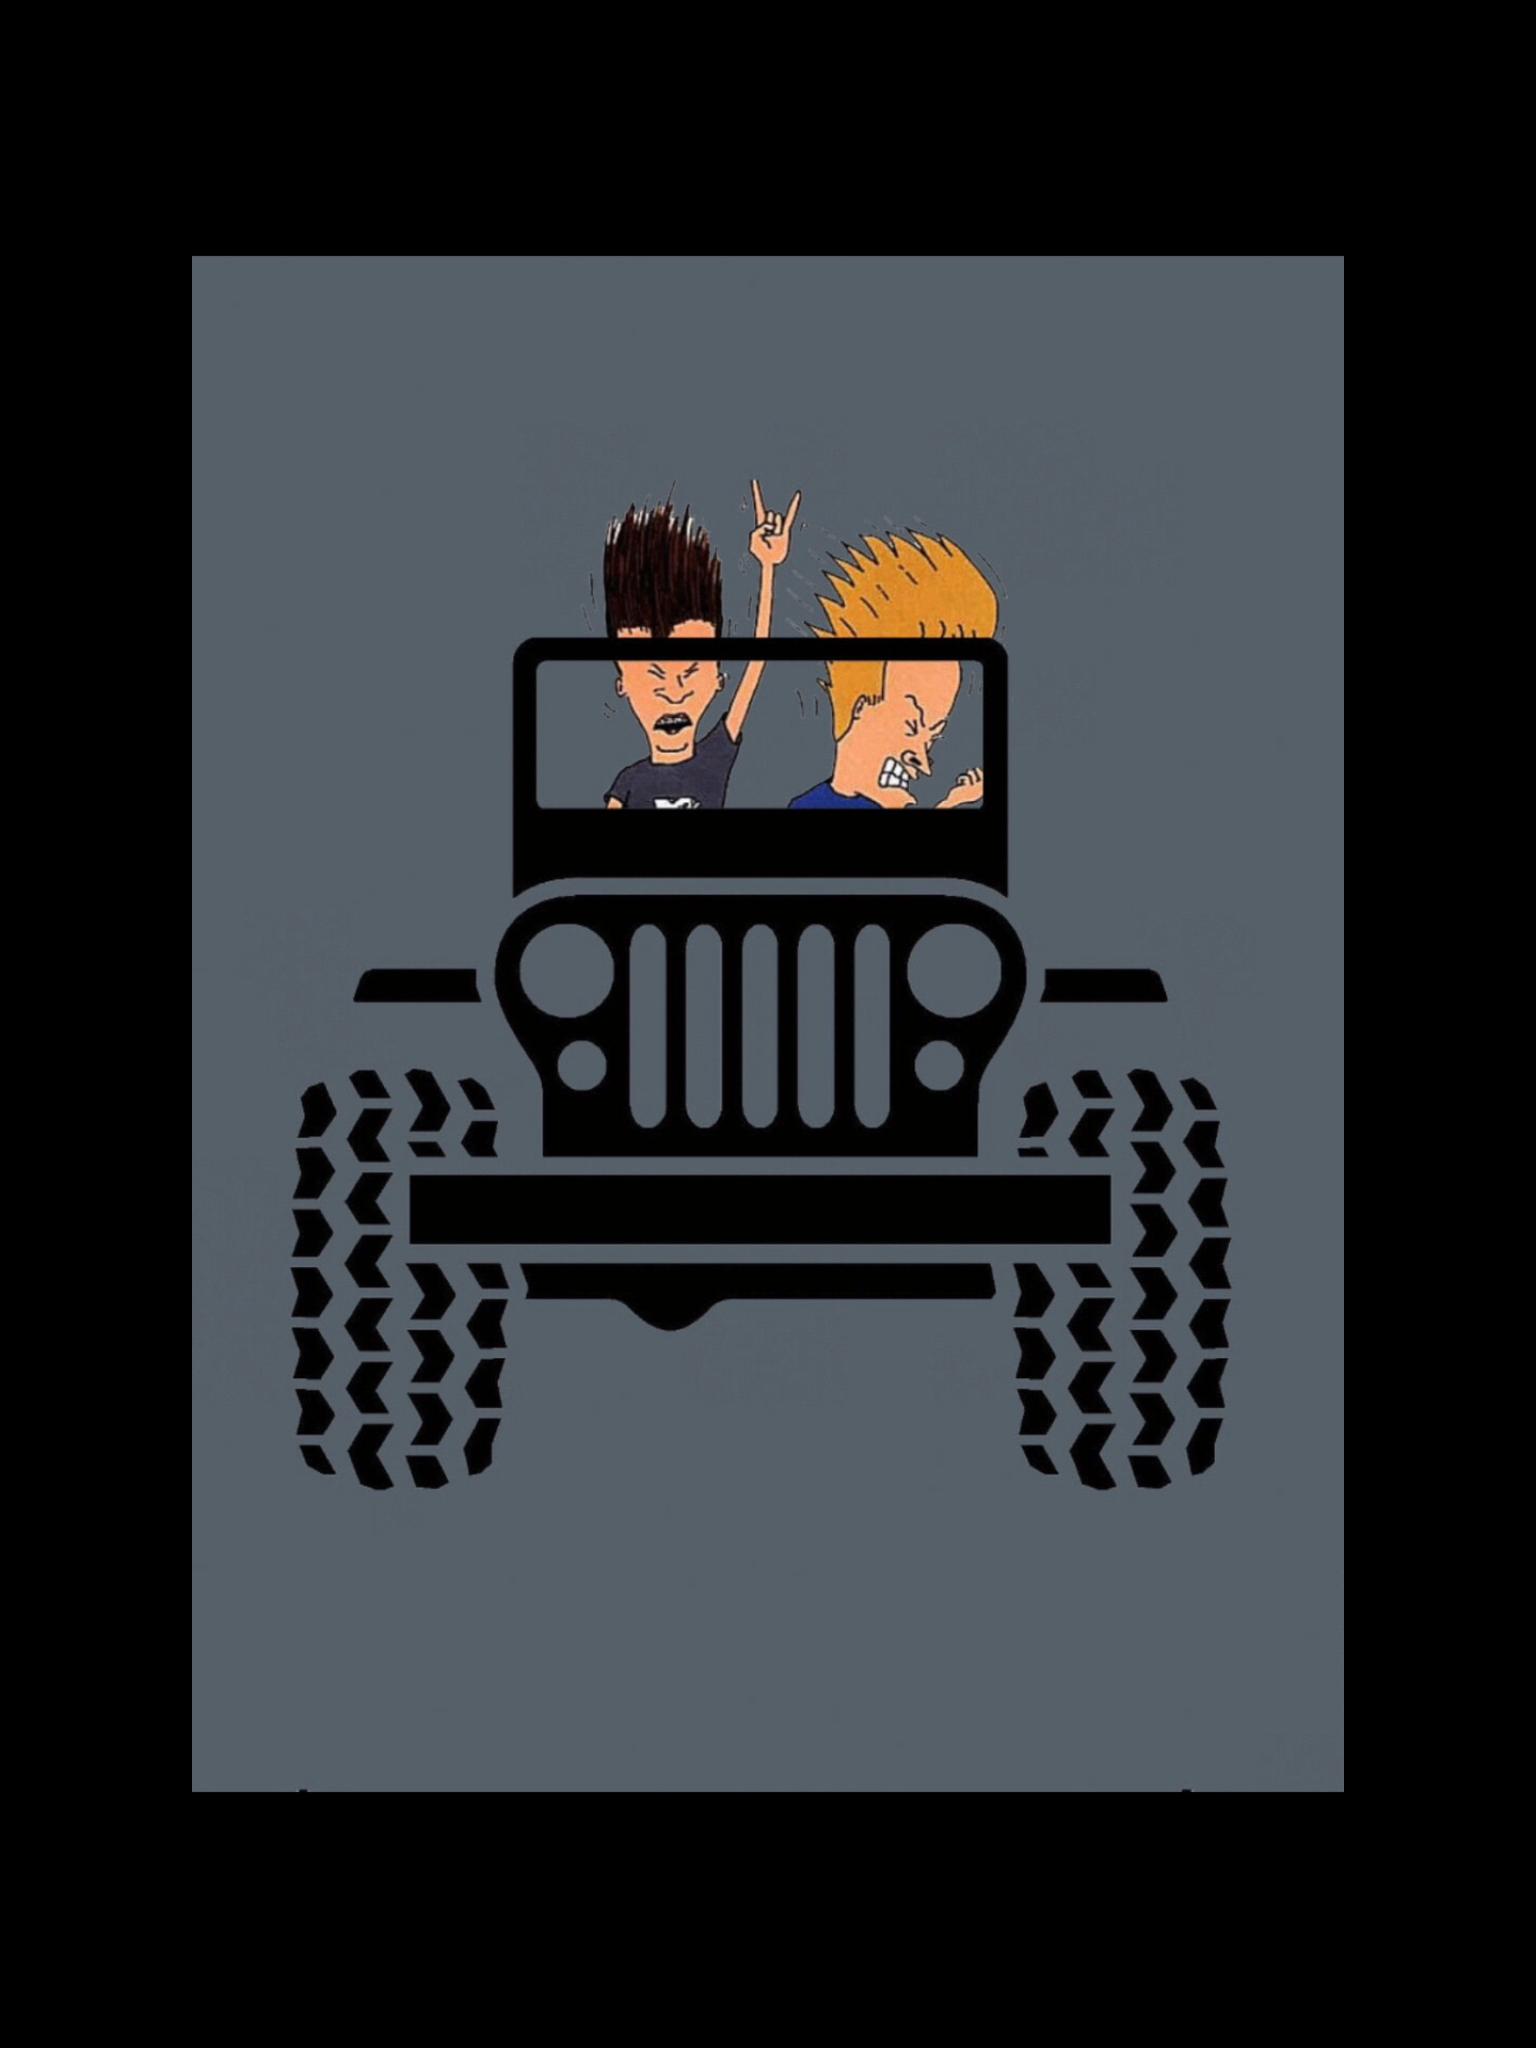 Jeep by Jeremy Reiser on Stuff I like Custom monogram